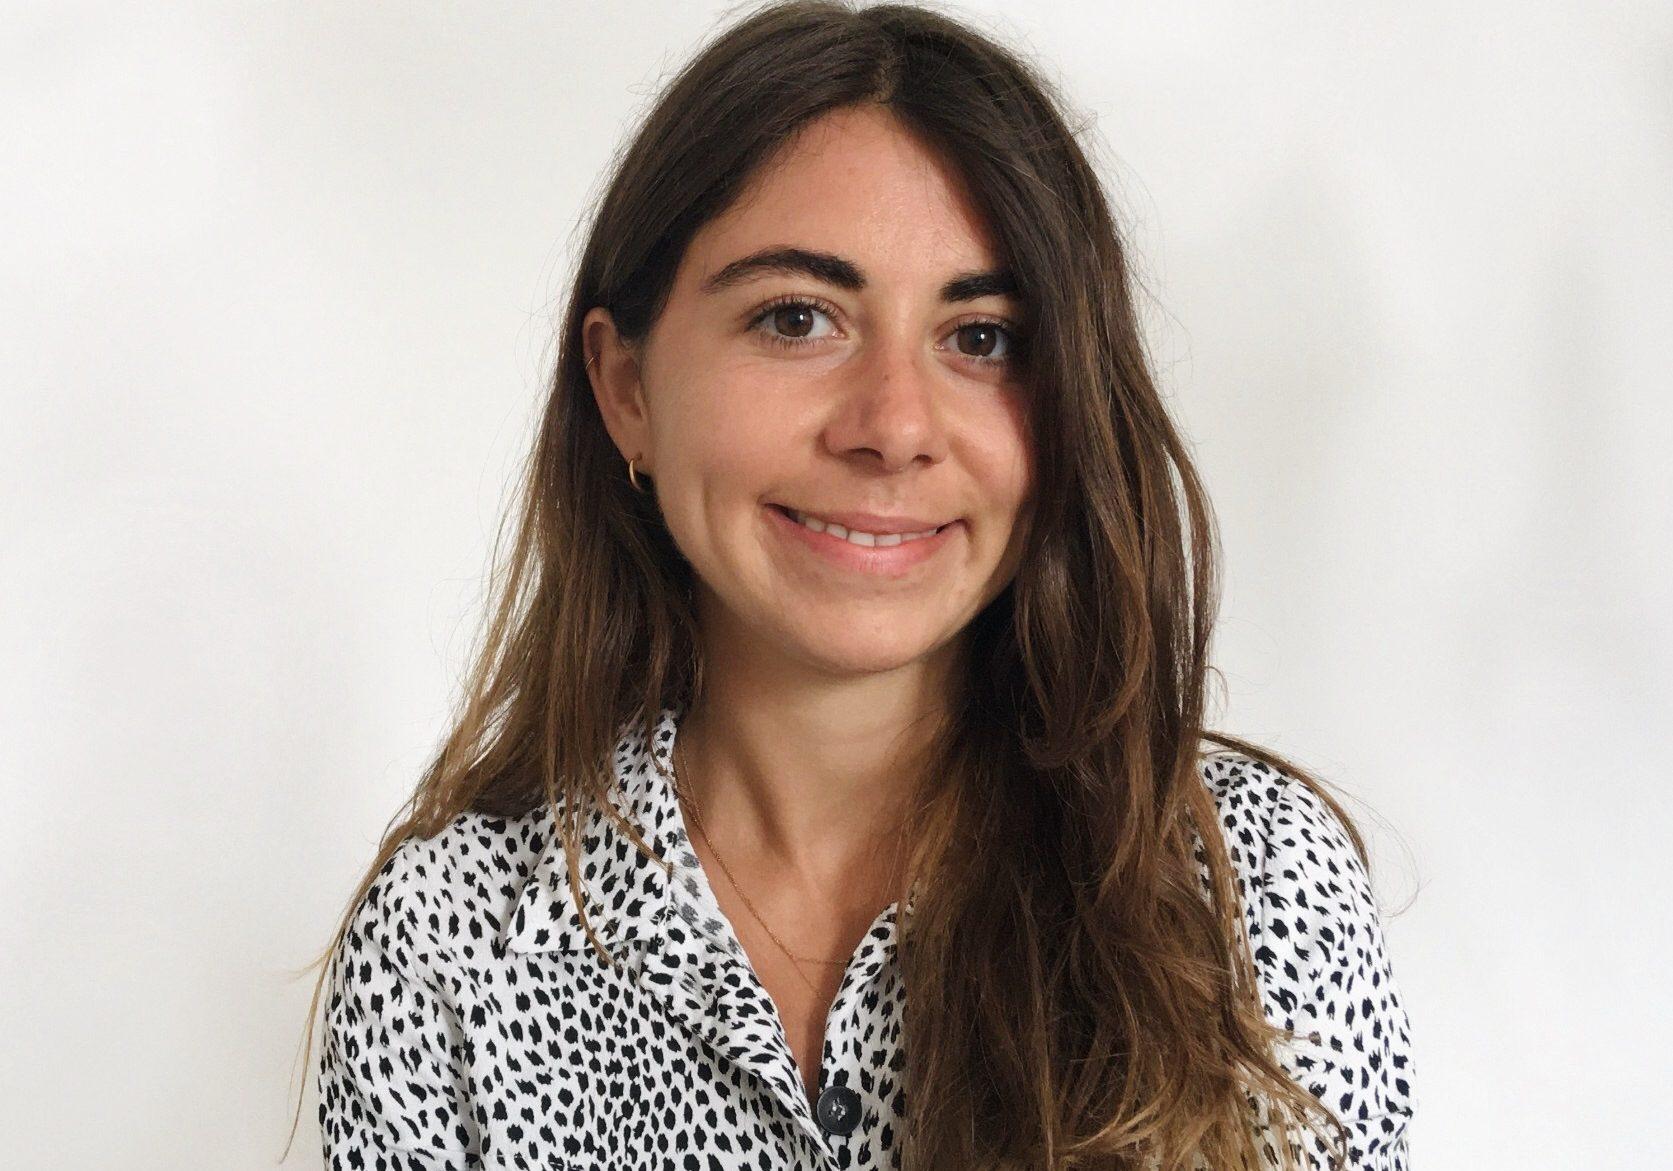 Aylin Sarica